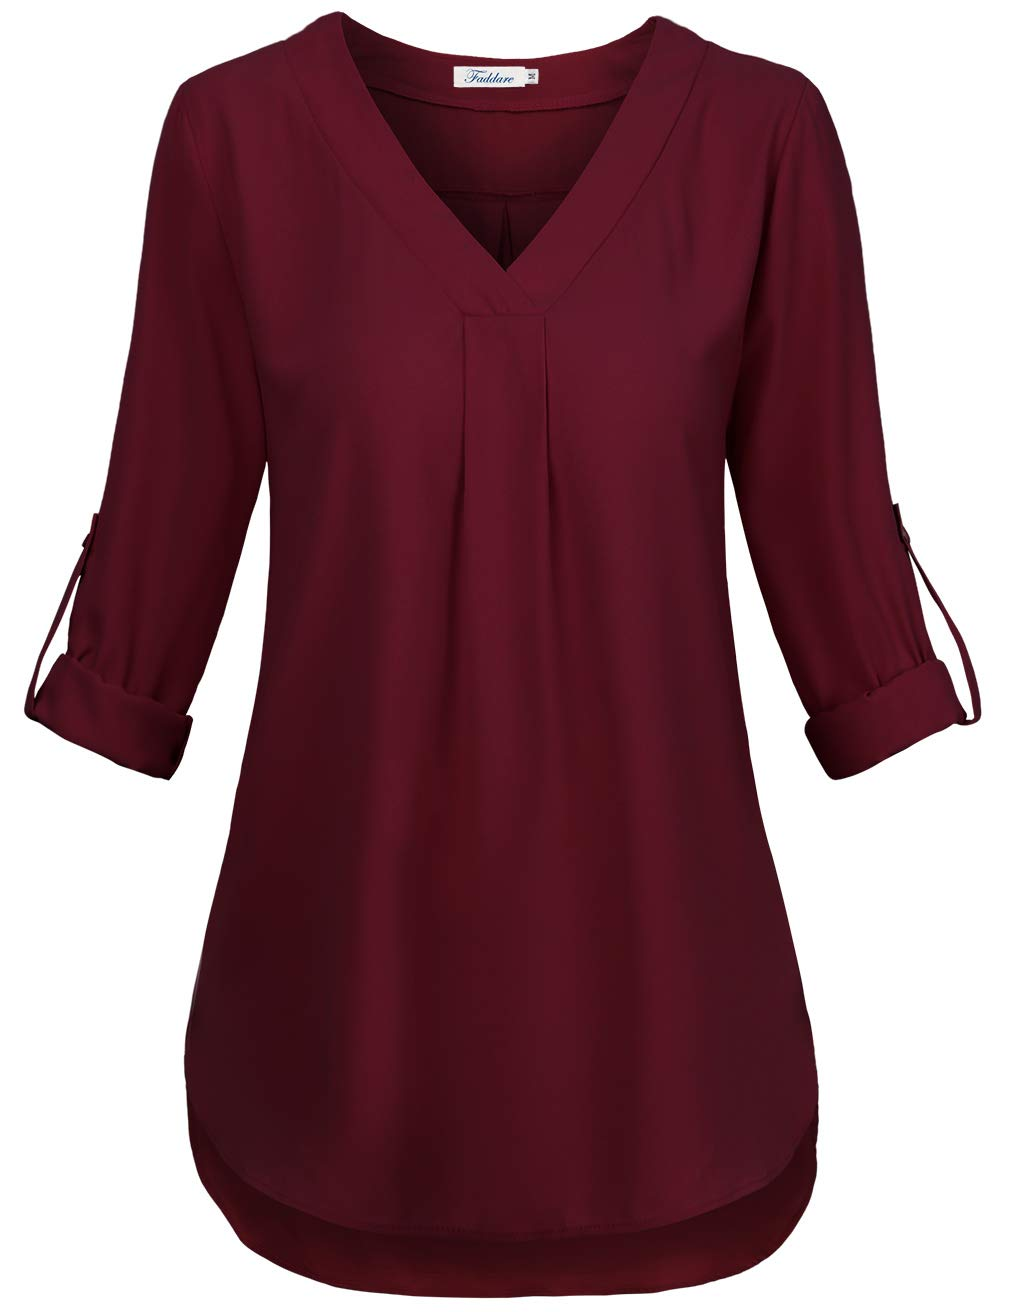 Faddare Long Sleeve Henley Shirt V Neck Tunic Blouse Tops,Flattering Shirts,Red XL